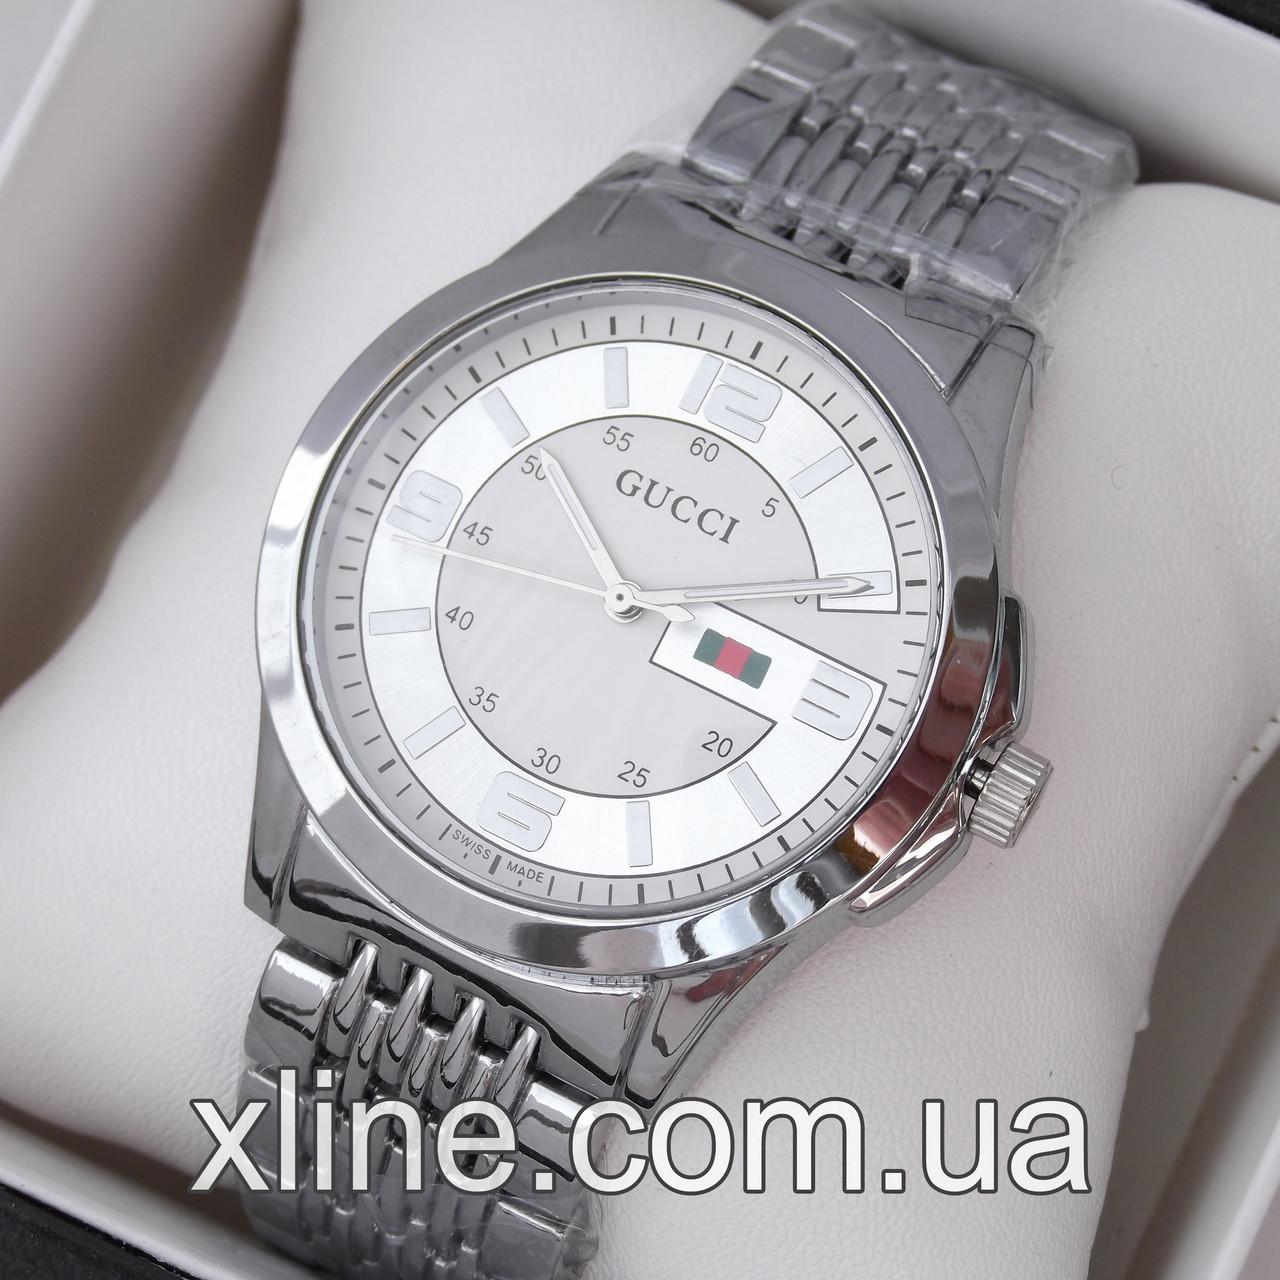 ca42a4cb95fb Женские наручные часы Gucci M130 на металлическом браслете: продажа, цена в  Харькове. ...